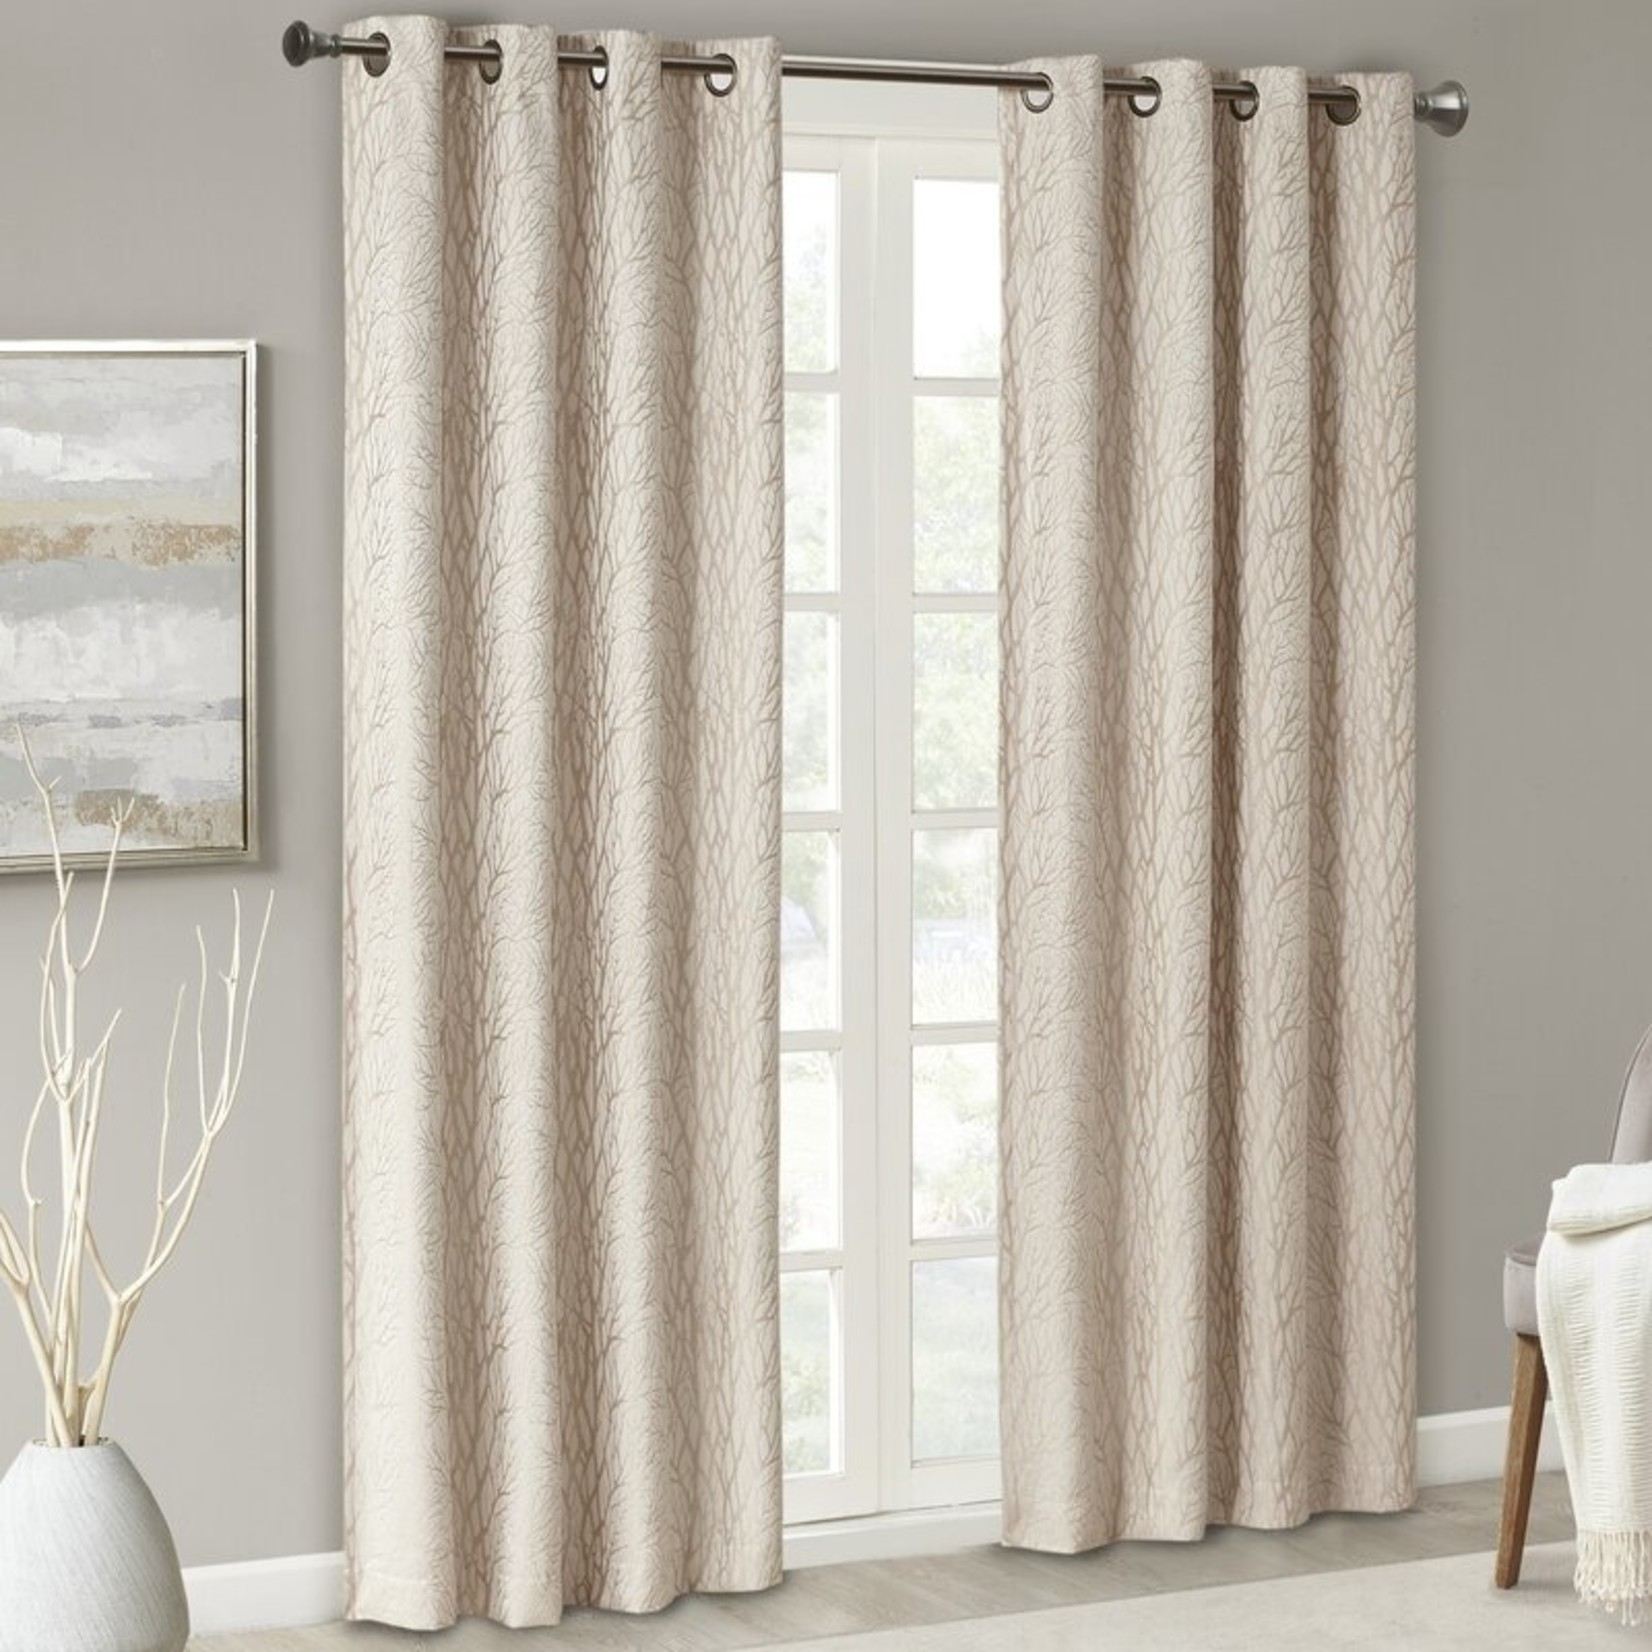 "*50"" x 95"" - Schoodic Branch Jacquard Blackout Thermal Grommet  Curtain Panels"